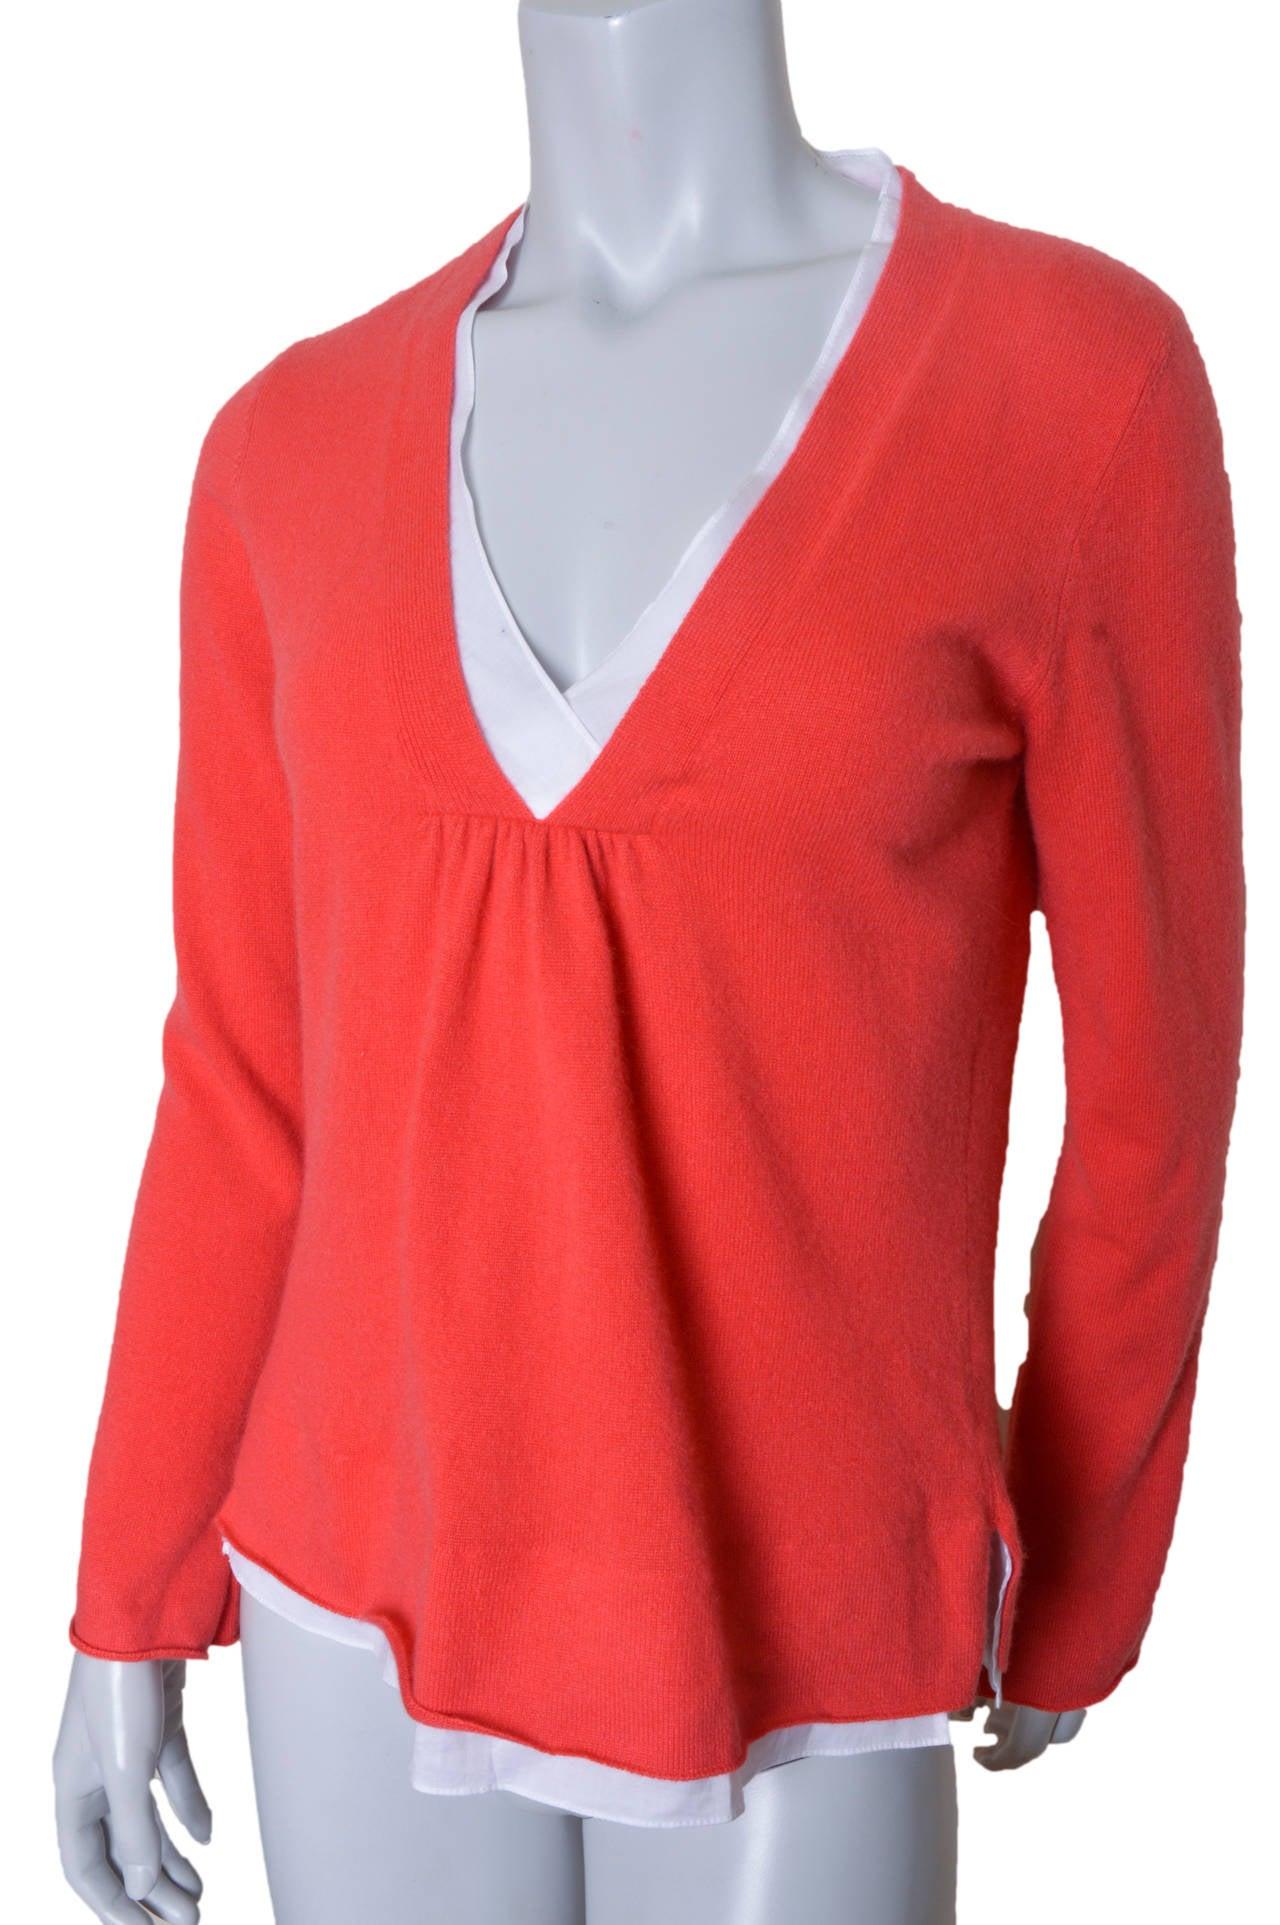 Brunello Cucinelli Orange Cashmere Sweater In Excellent Condition For Sale In San Francisco, CA